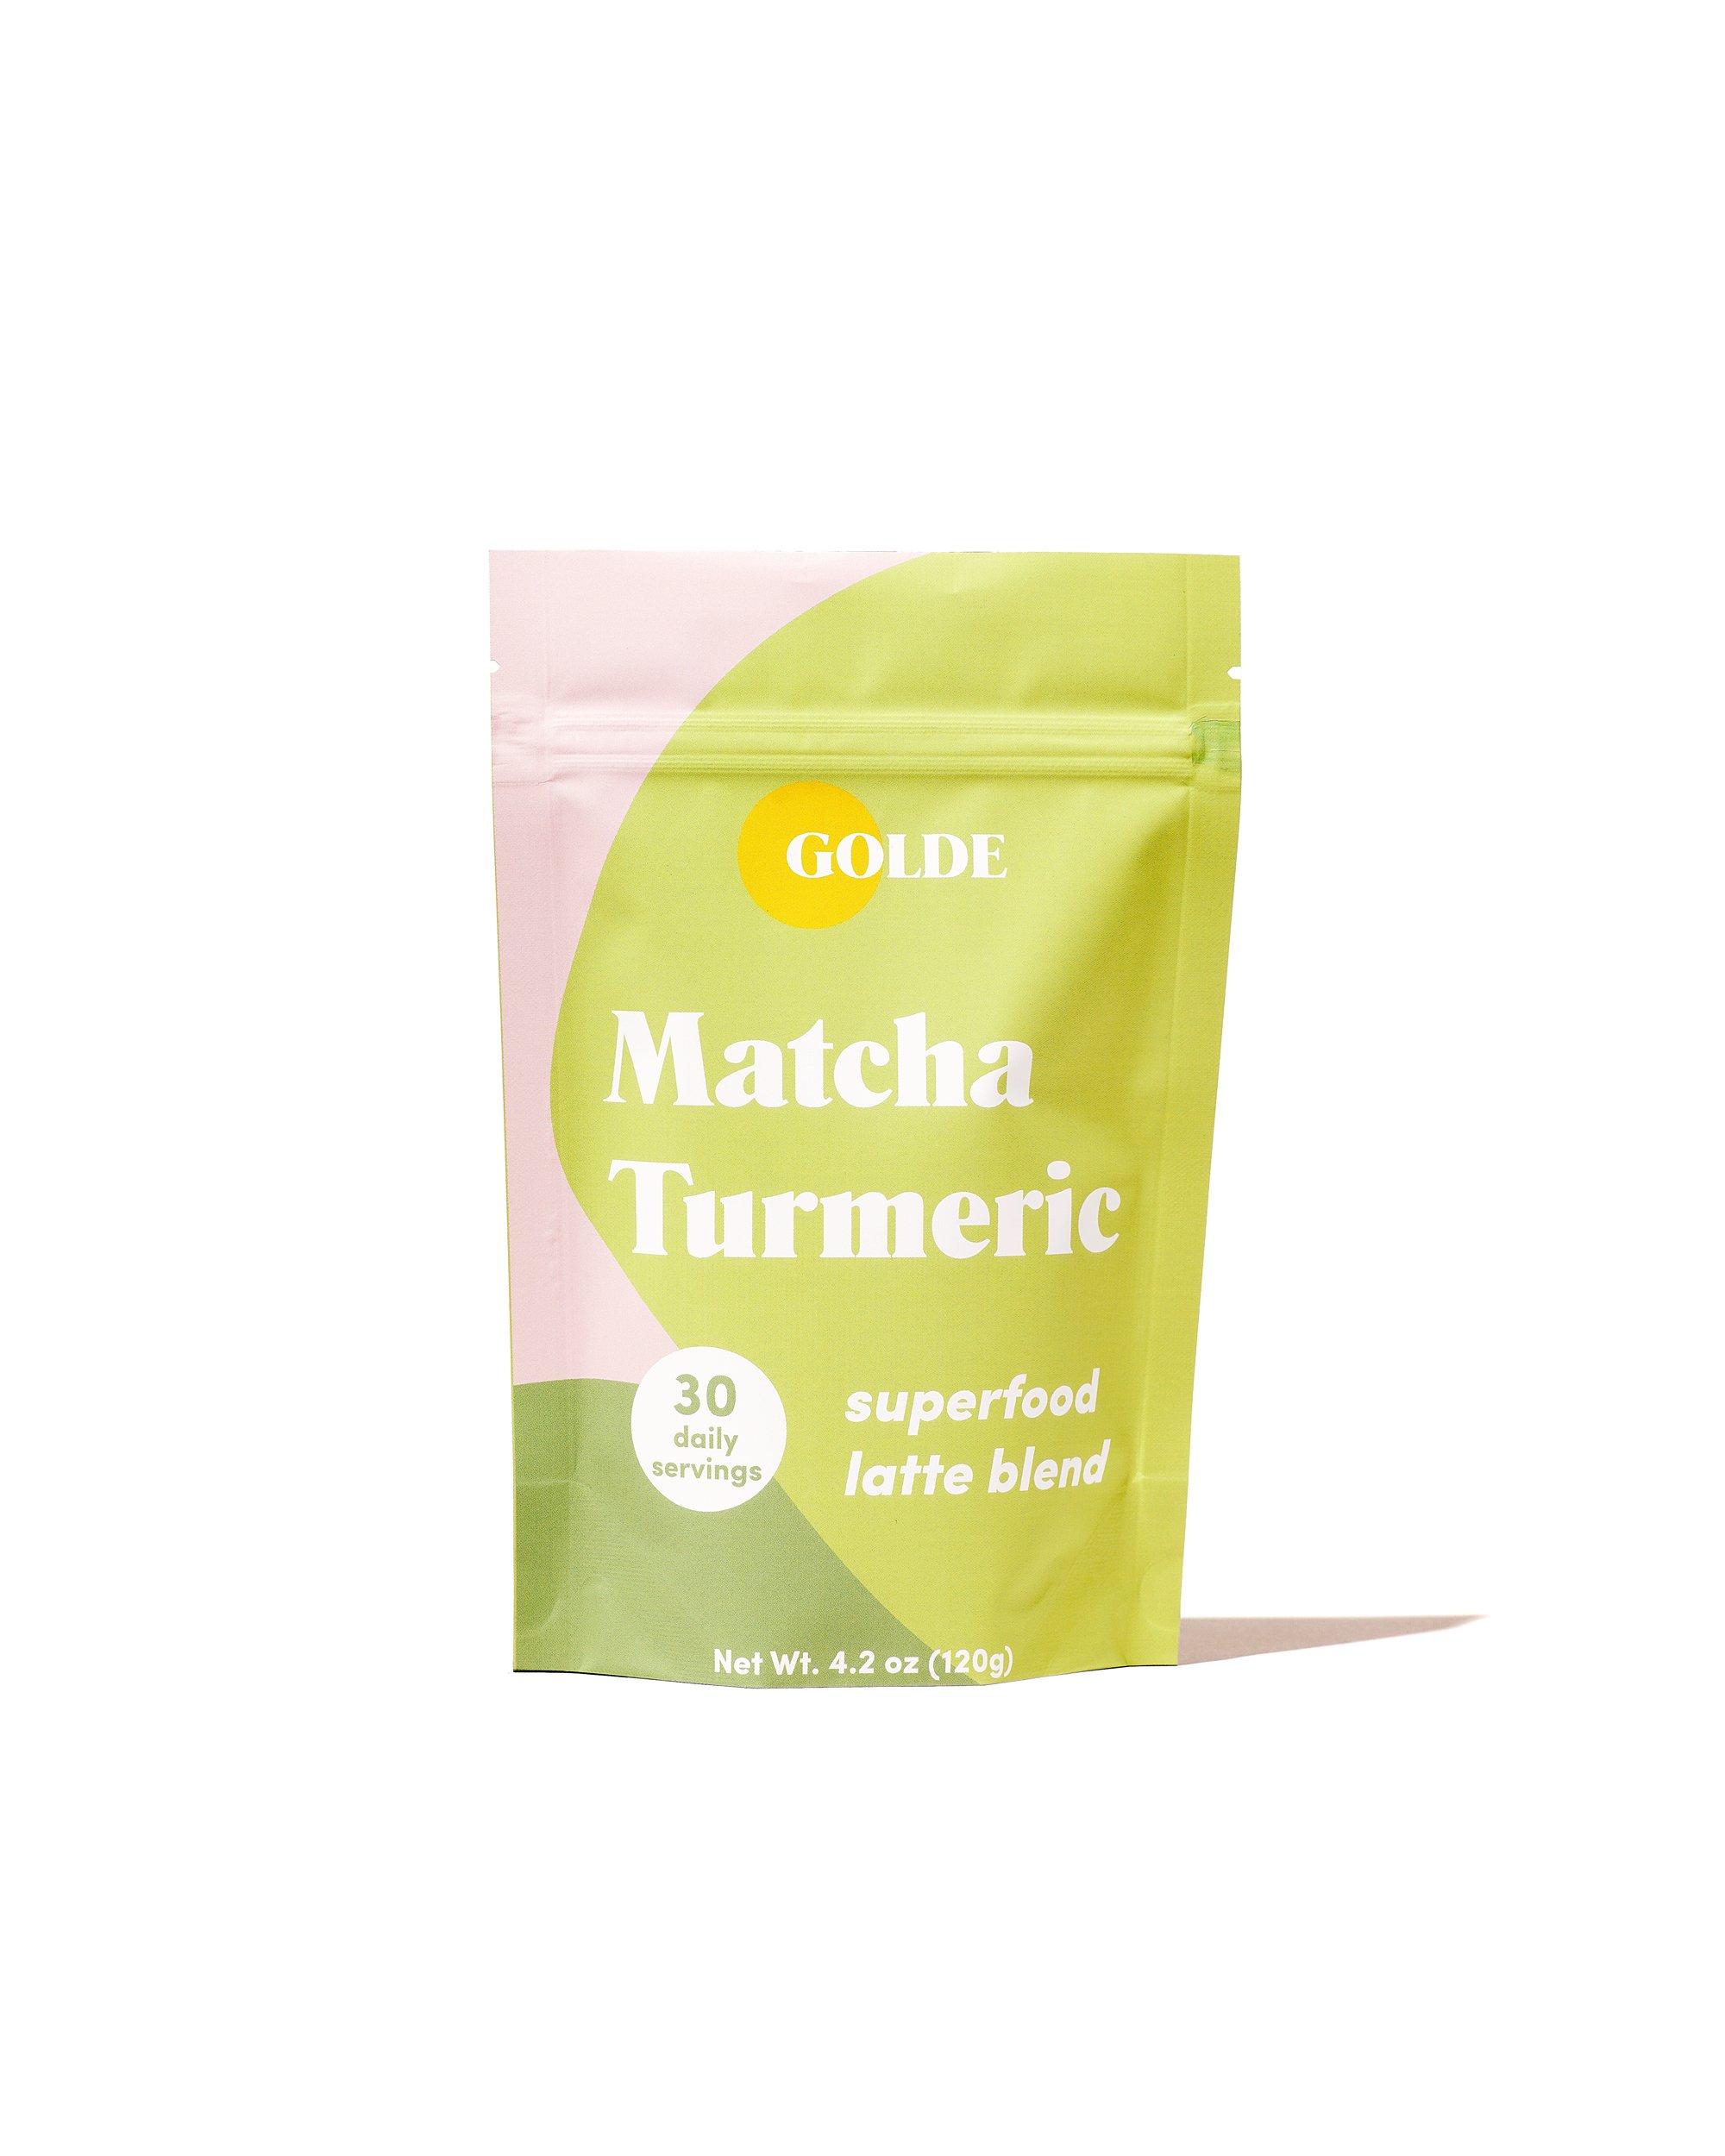 Golde Matcha Turmeric Latte Blend gimme the good stuff